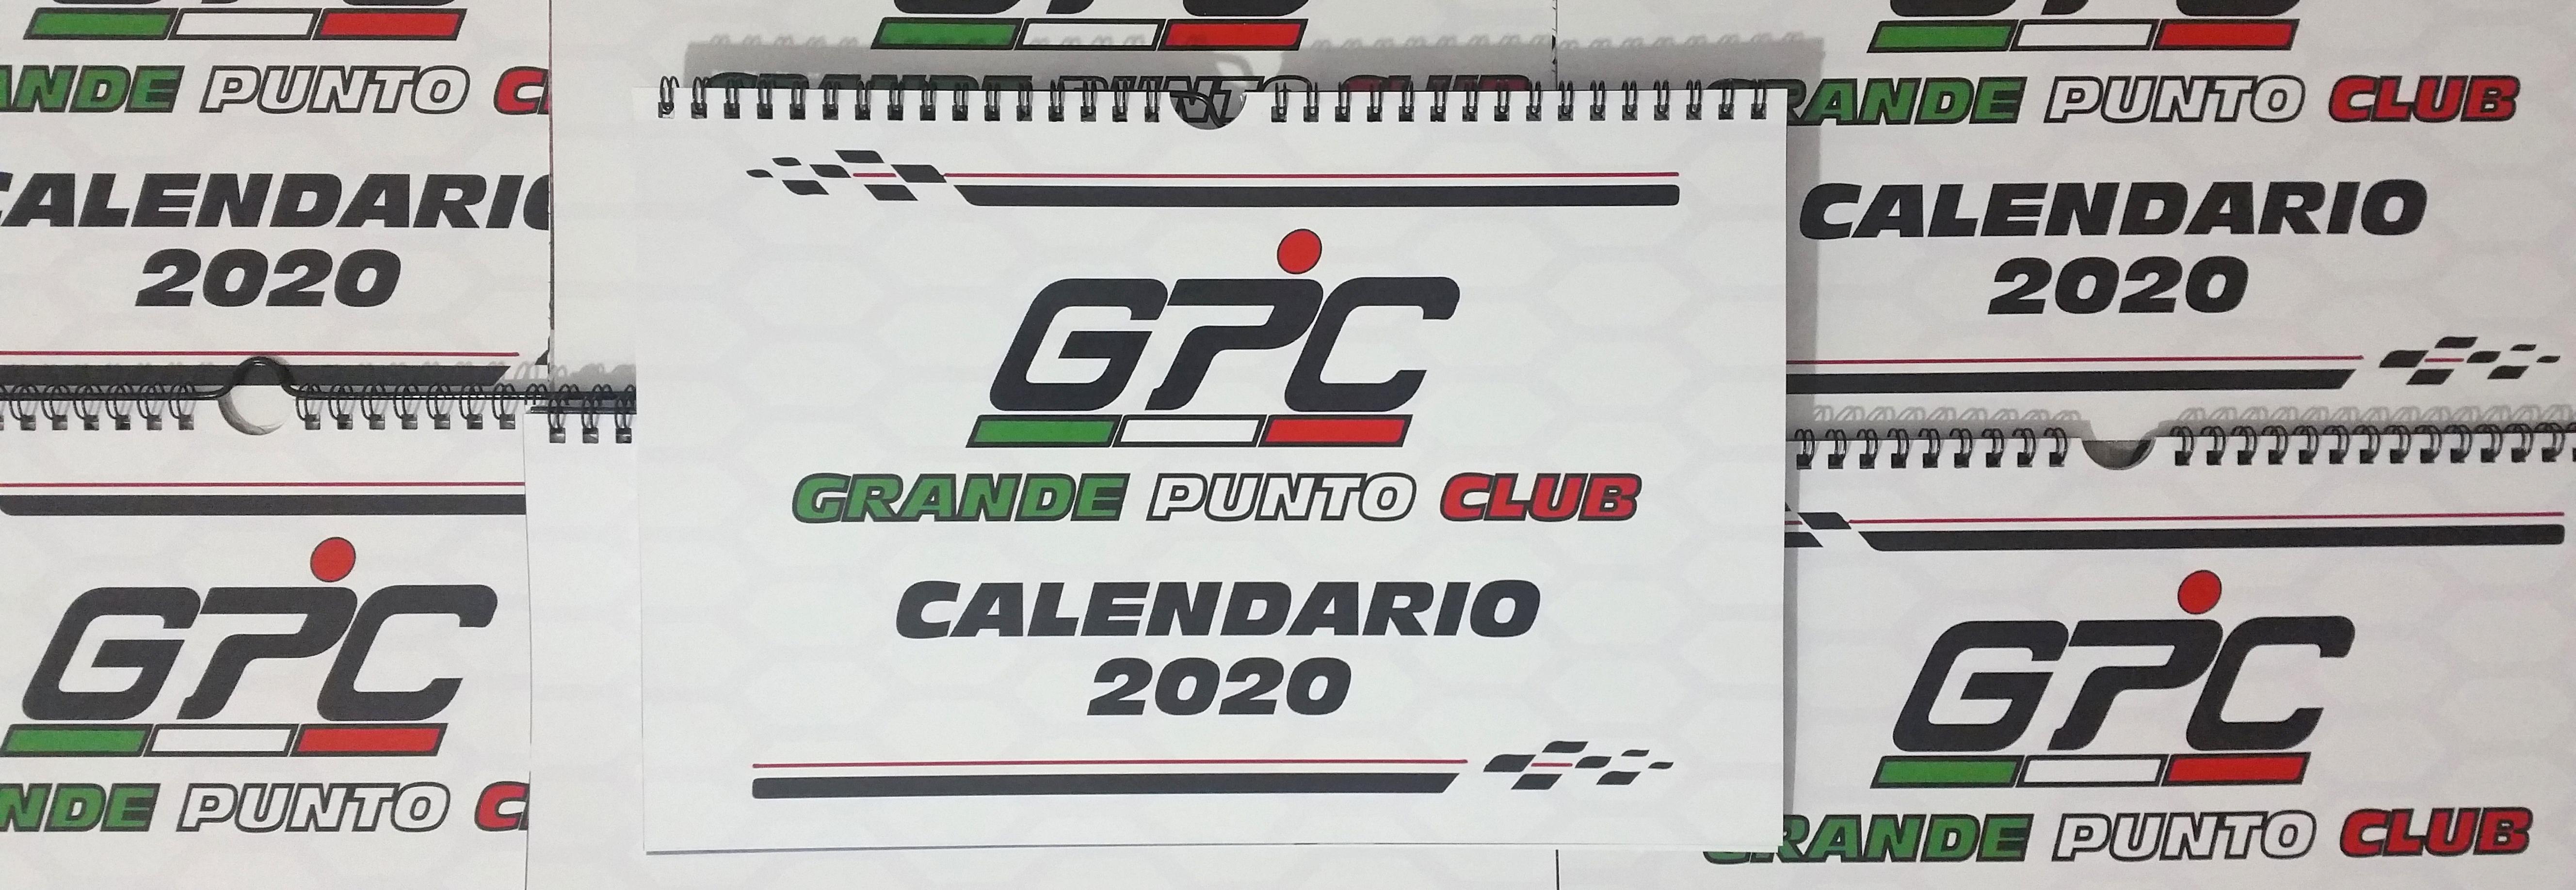 Calendario 2020 Grande Punto Club